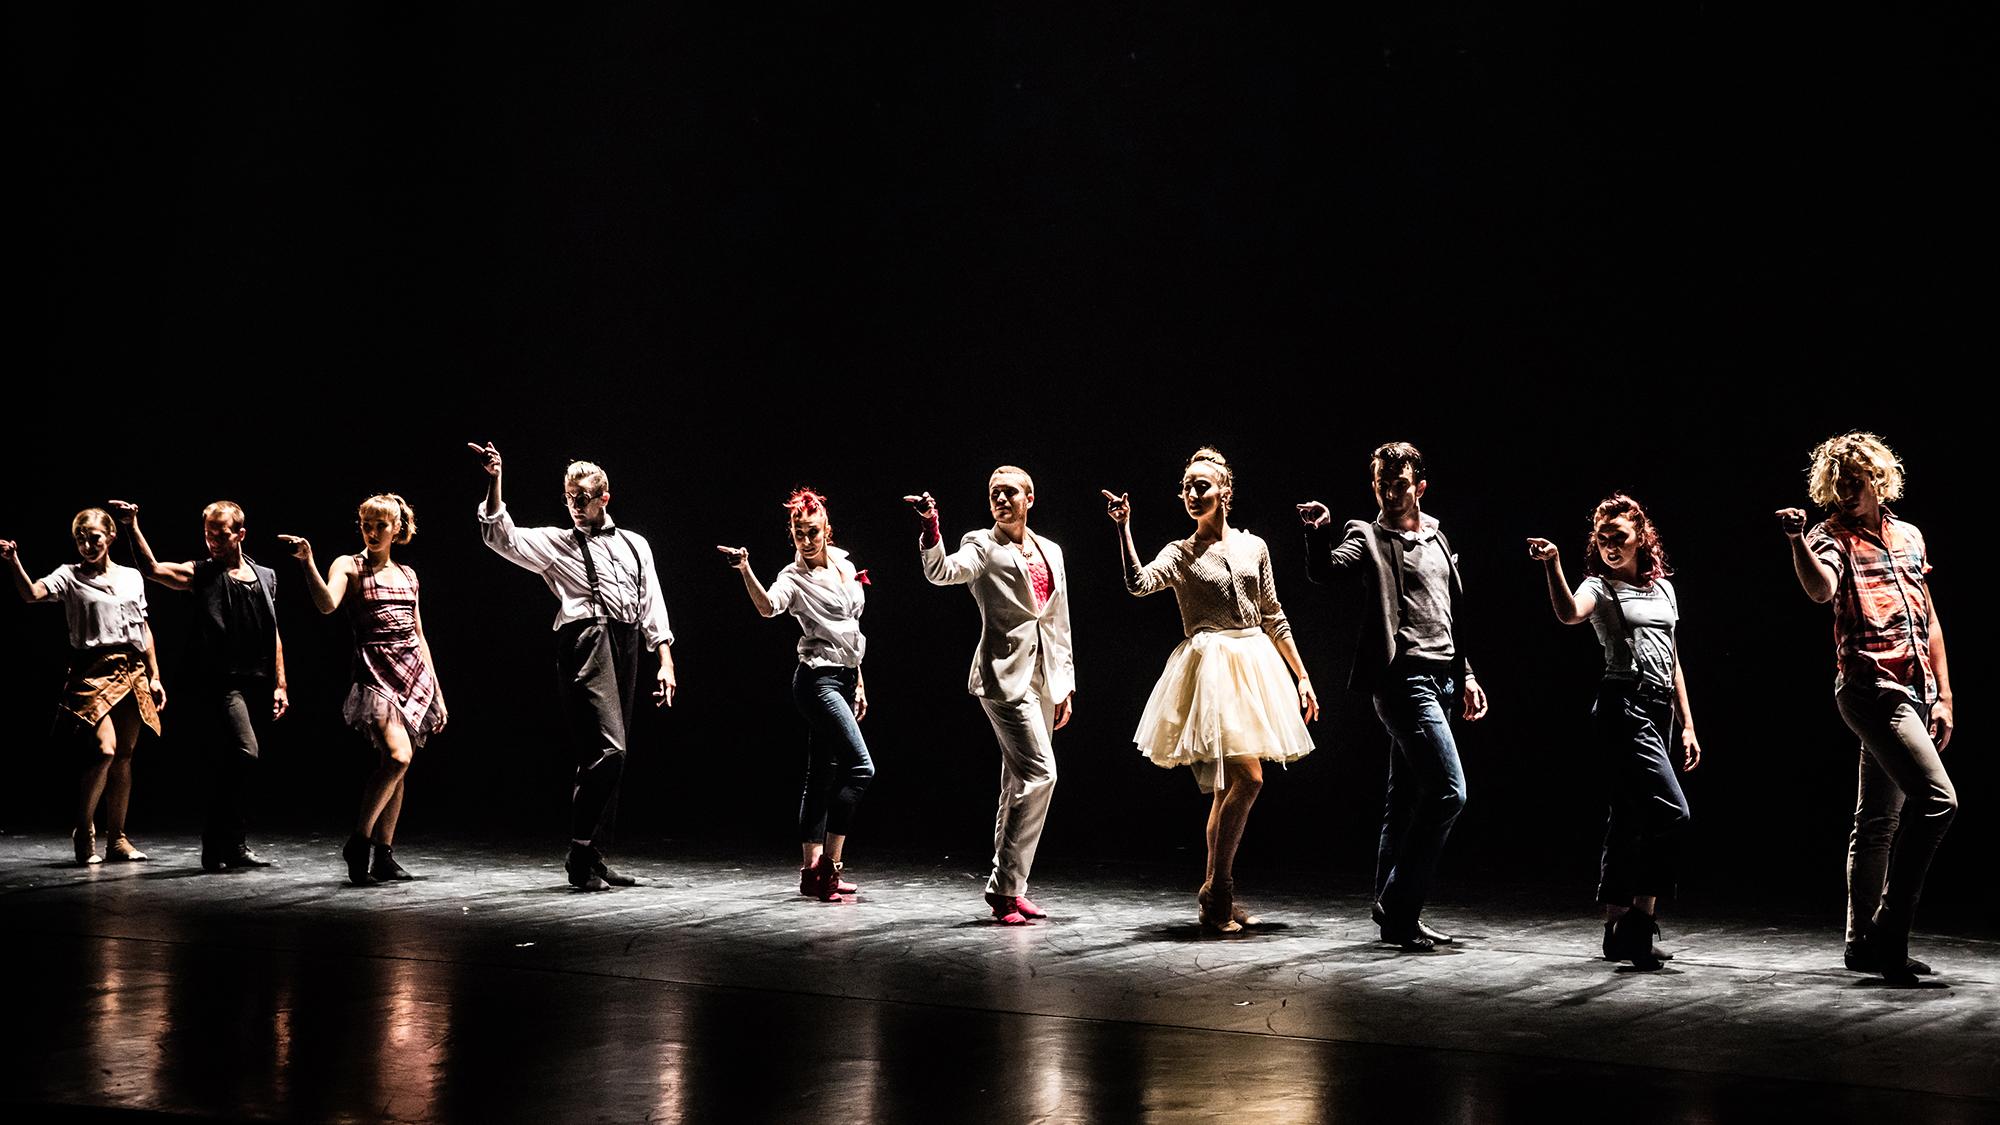 BJM - Les Ballets Jazz de Montréal, O Balcao de Amor